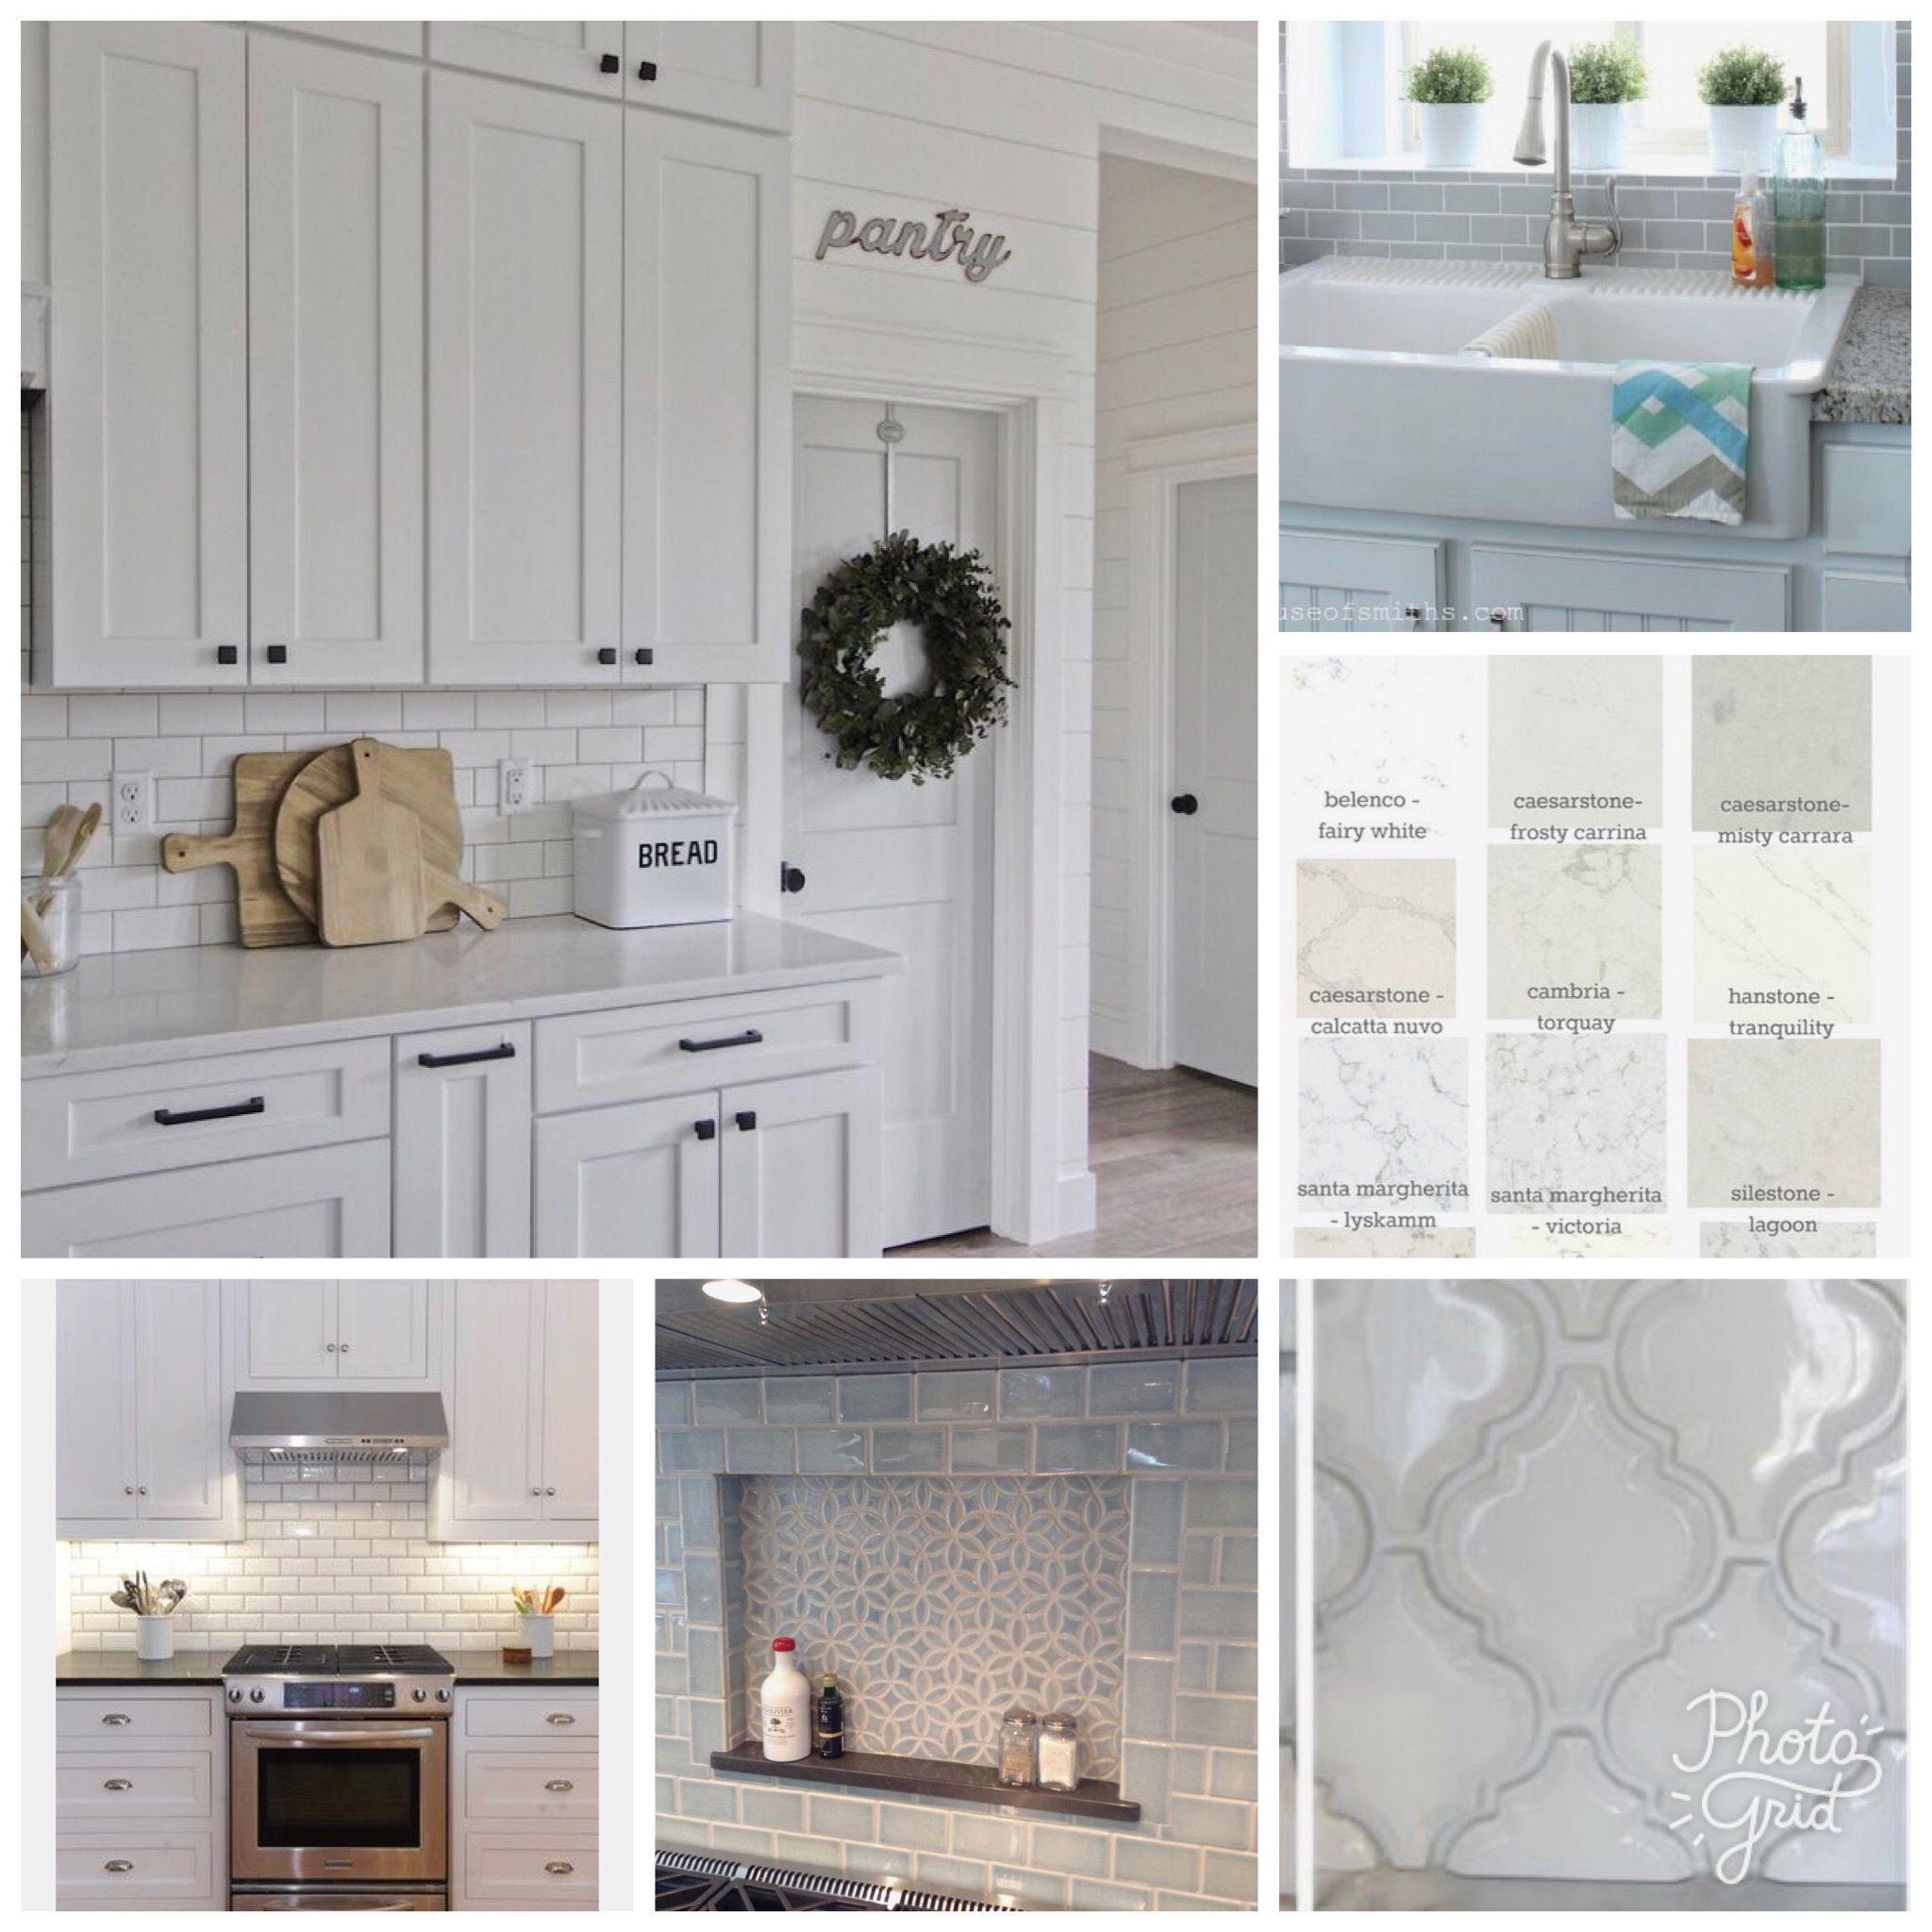 #mykitchenLookBook 1) white shaker cabinets w hidden ...